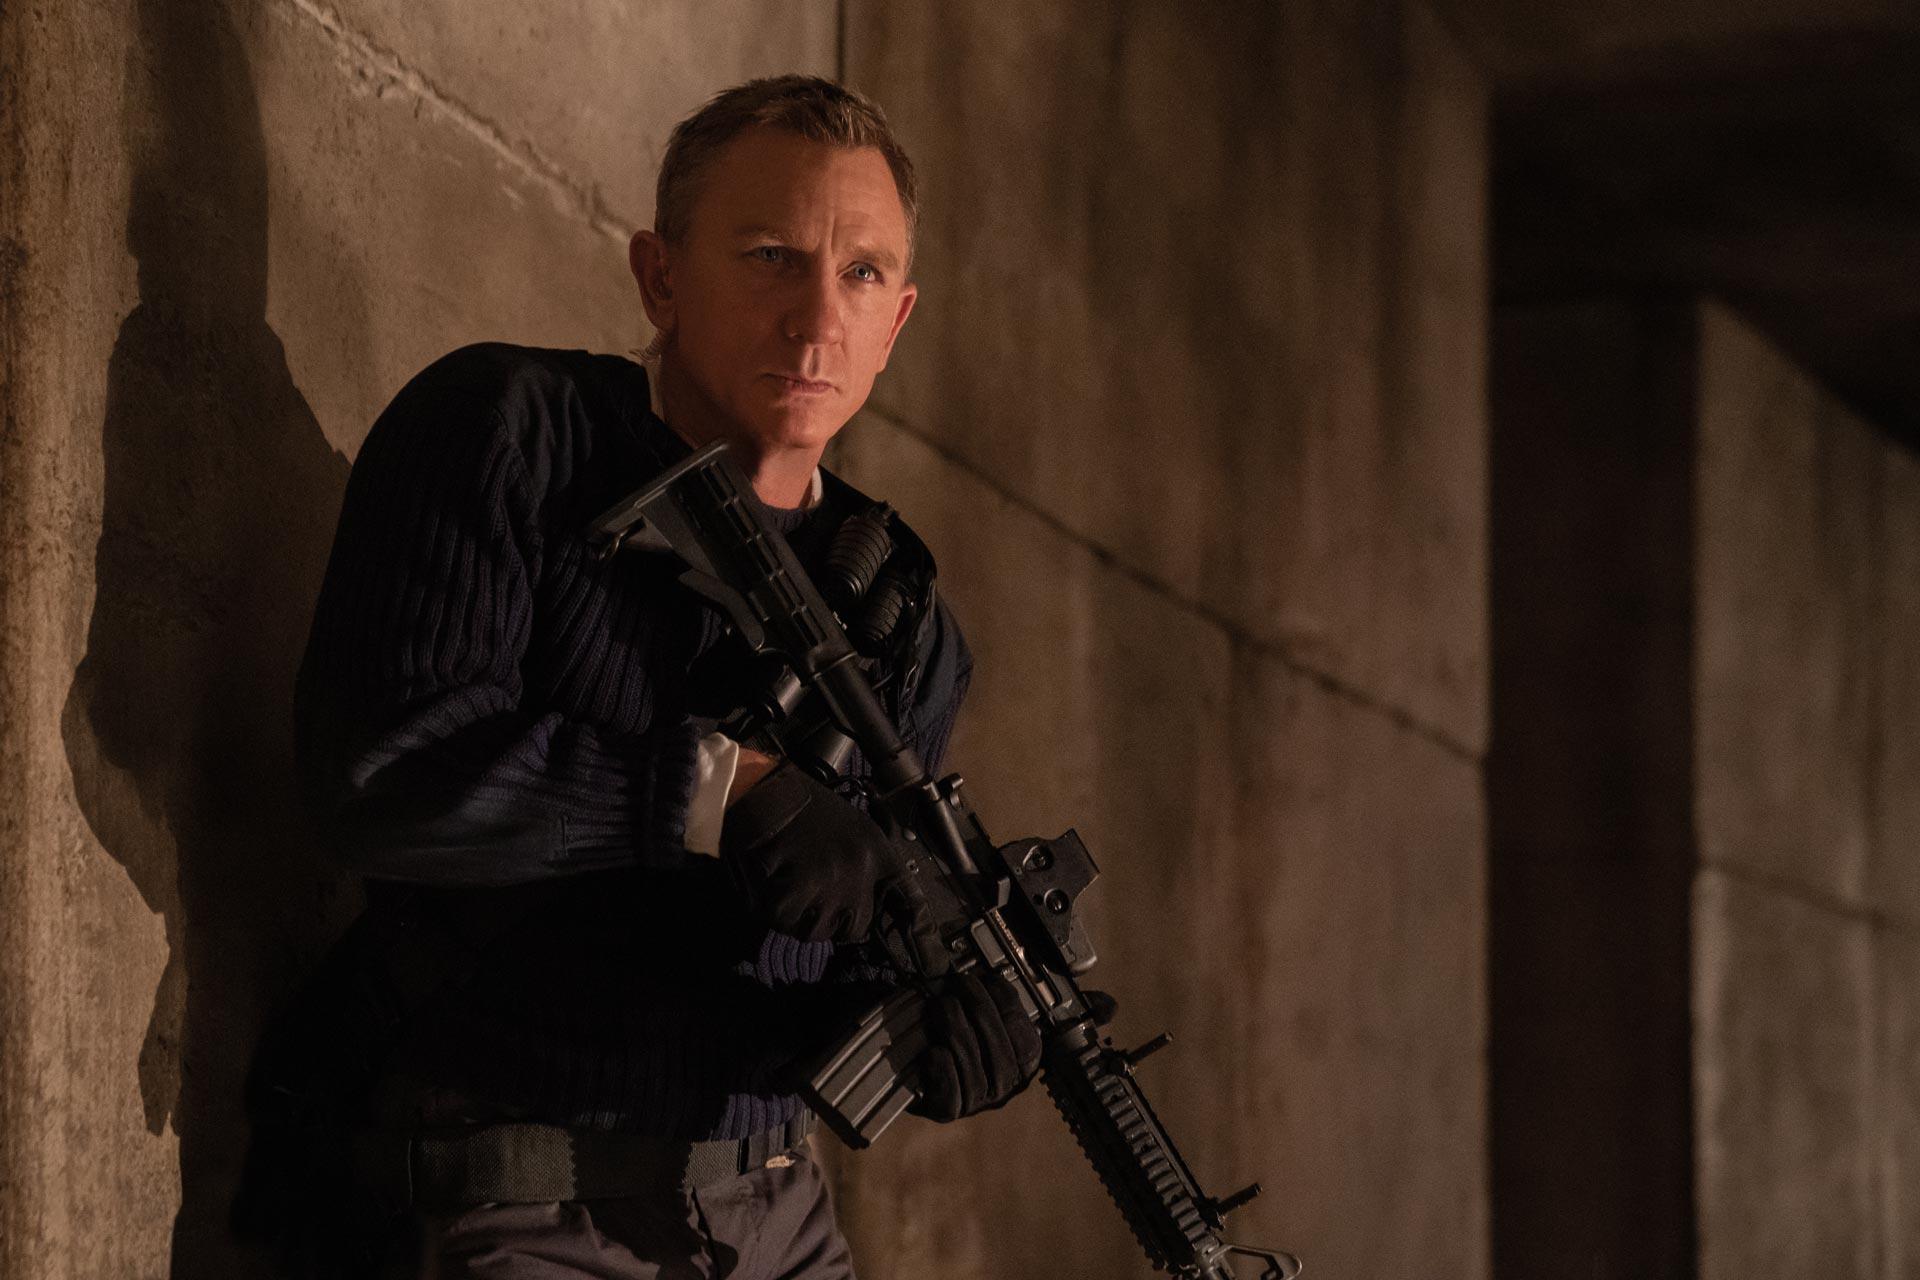 Actor Daniel Craig as James Bond, holding a large automatic weapon.